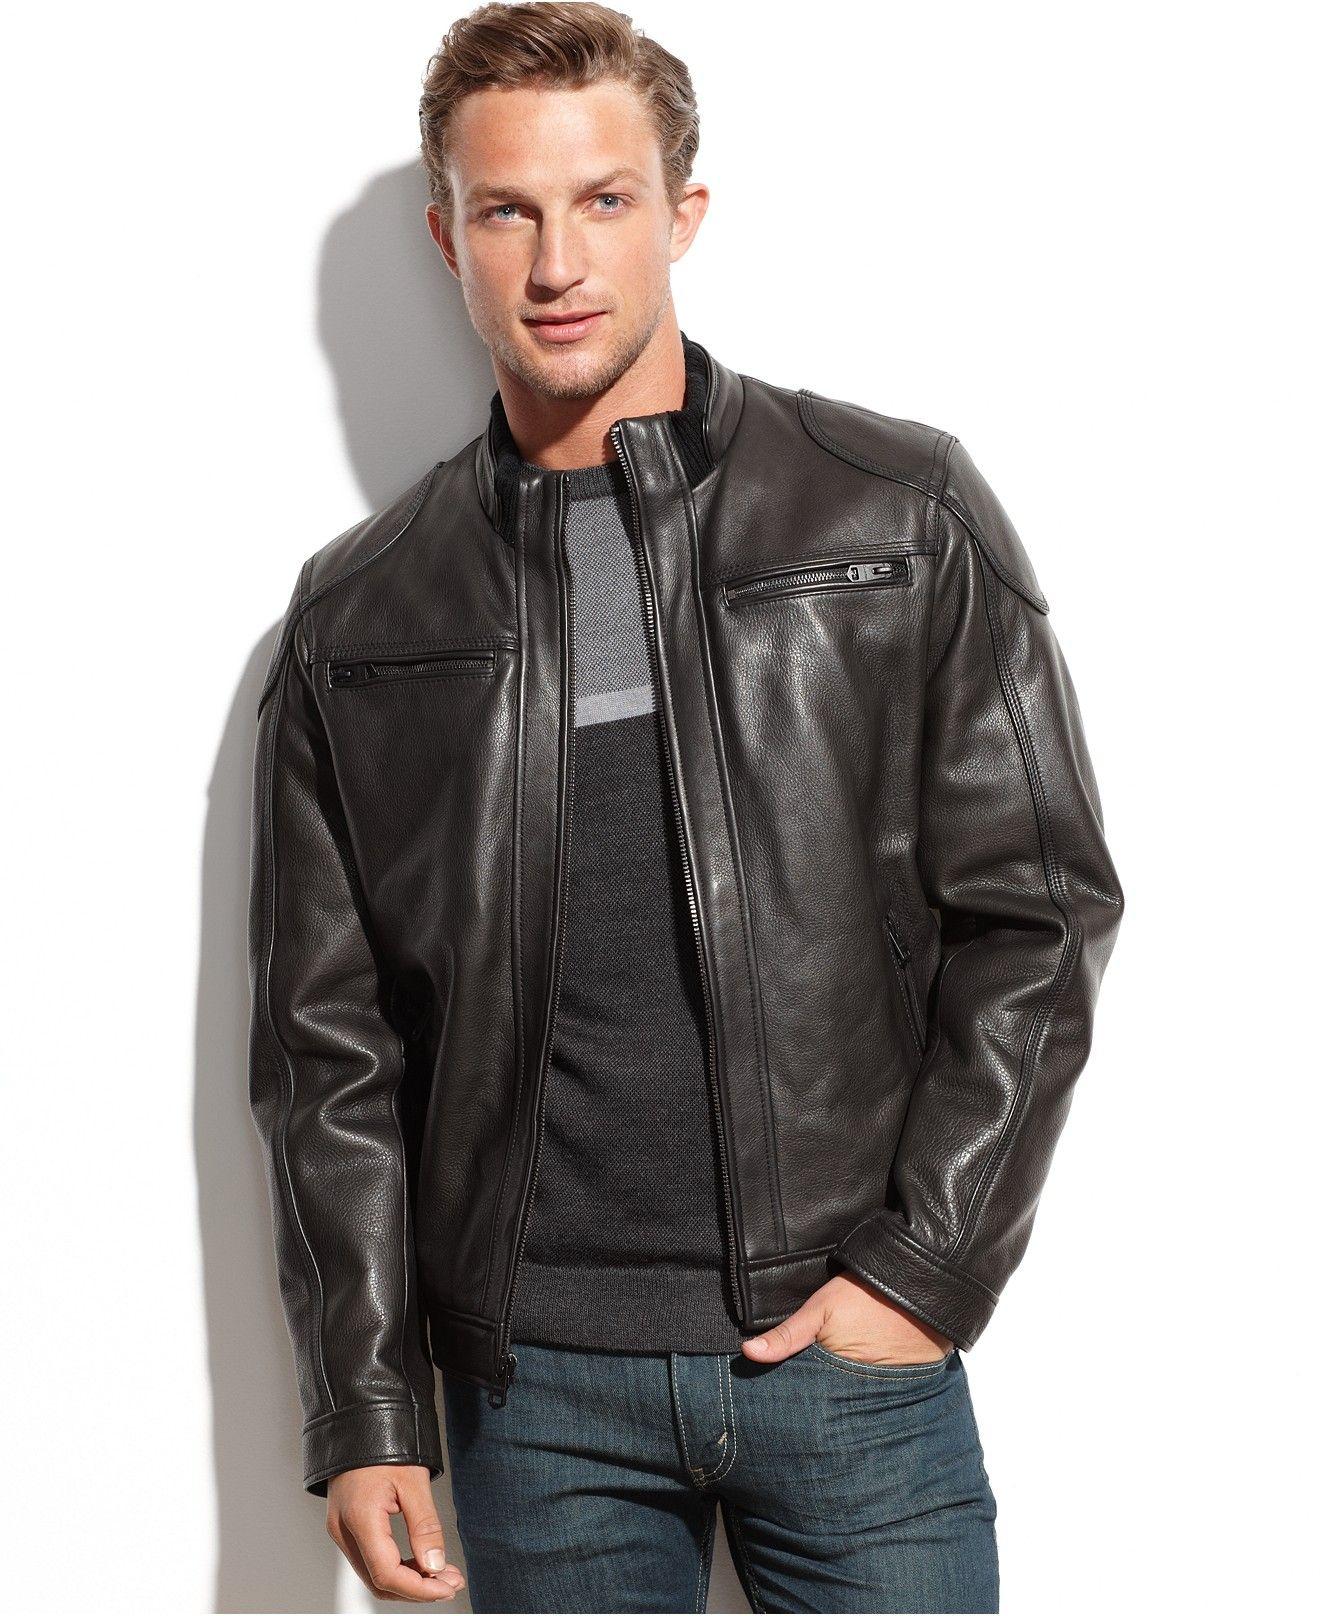 Calvin Klein Leather Moto Jacket Coats Jackets Men Macy S Leather Jeans Men Black Leather Moto Jacket Leather Moto Jacket [ 1616 x 1320 Pixel ]